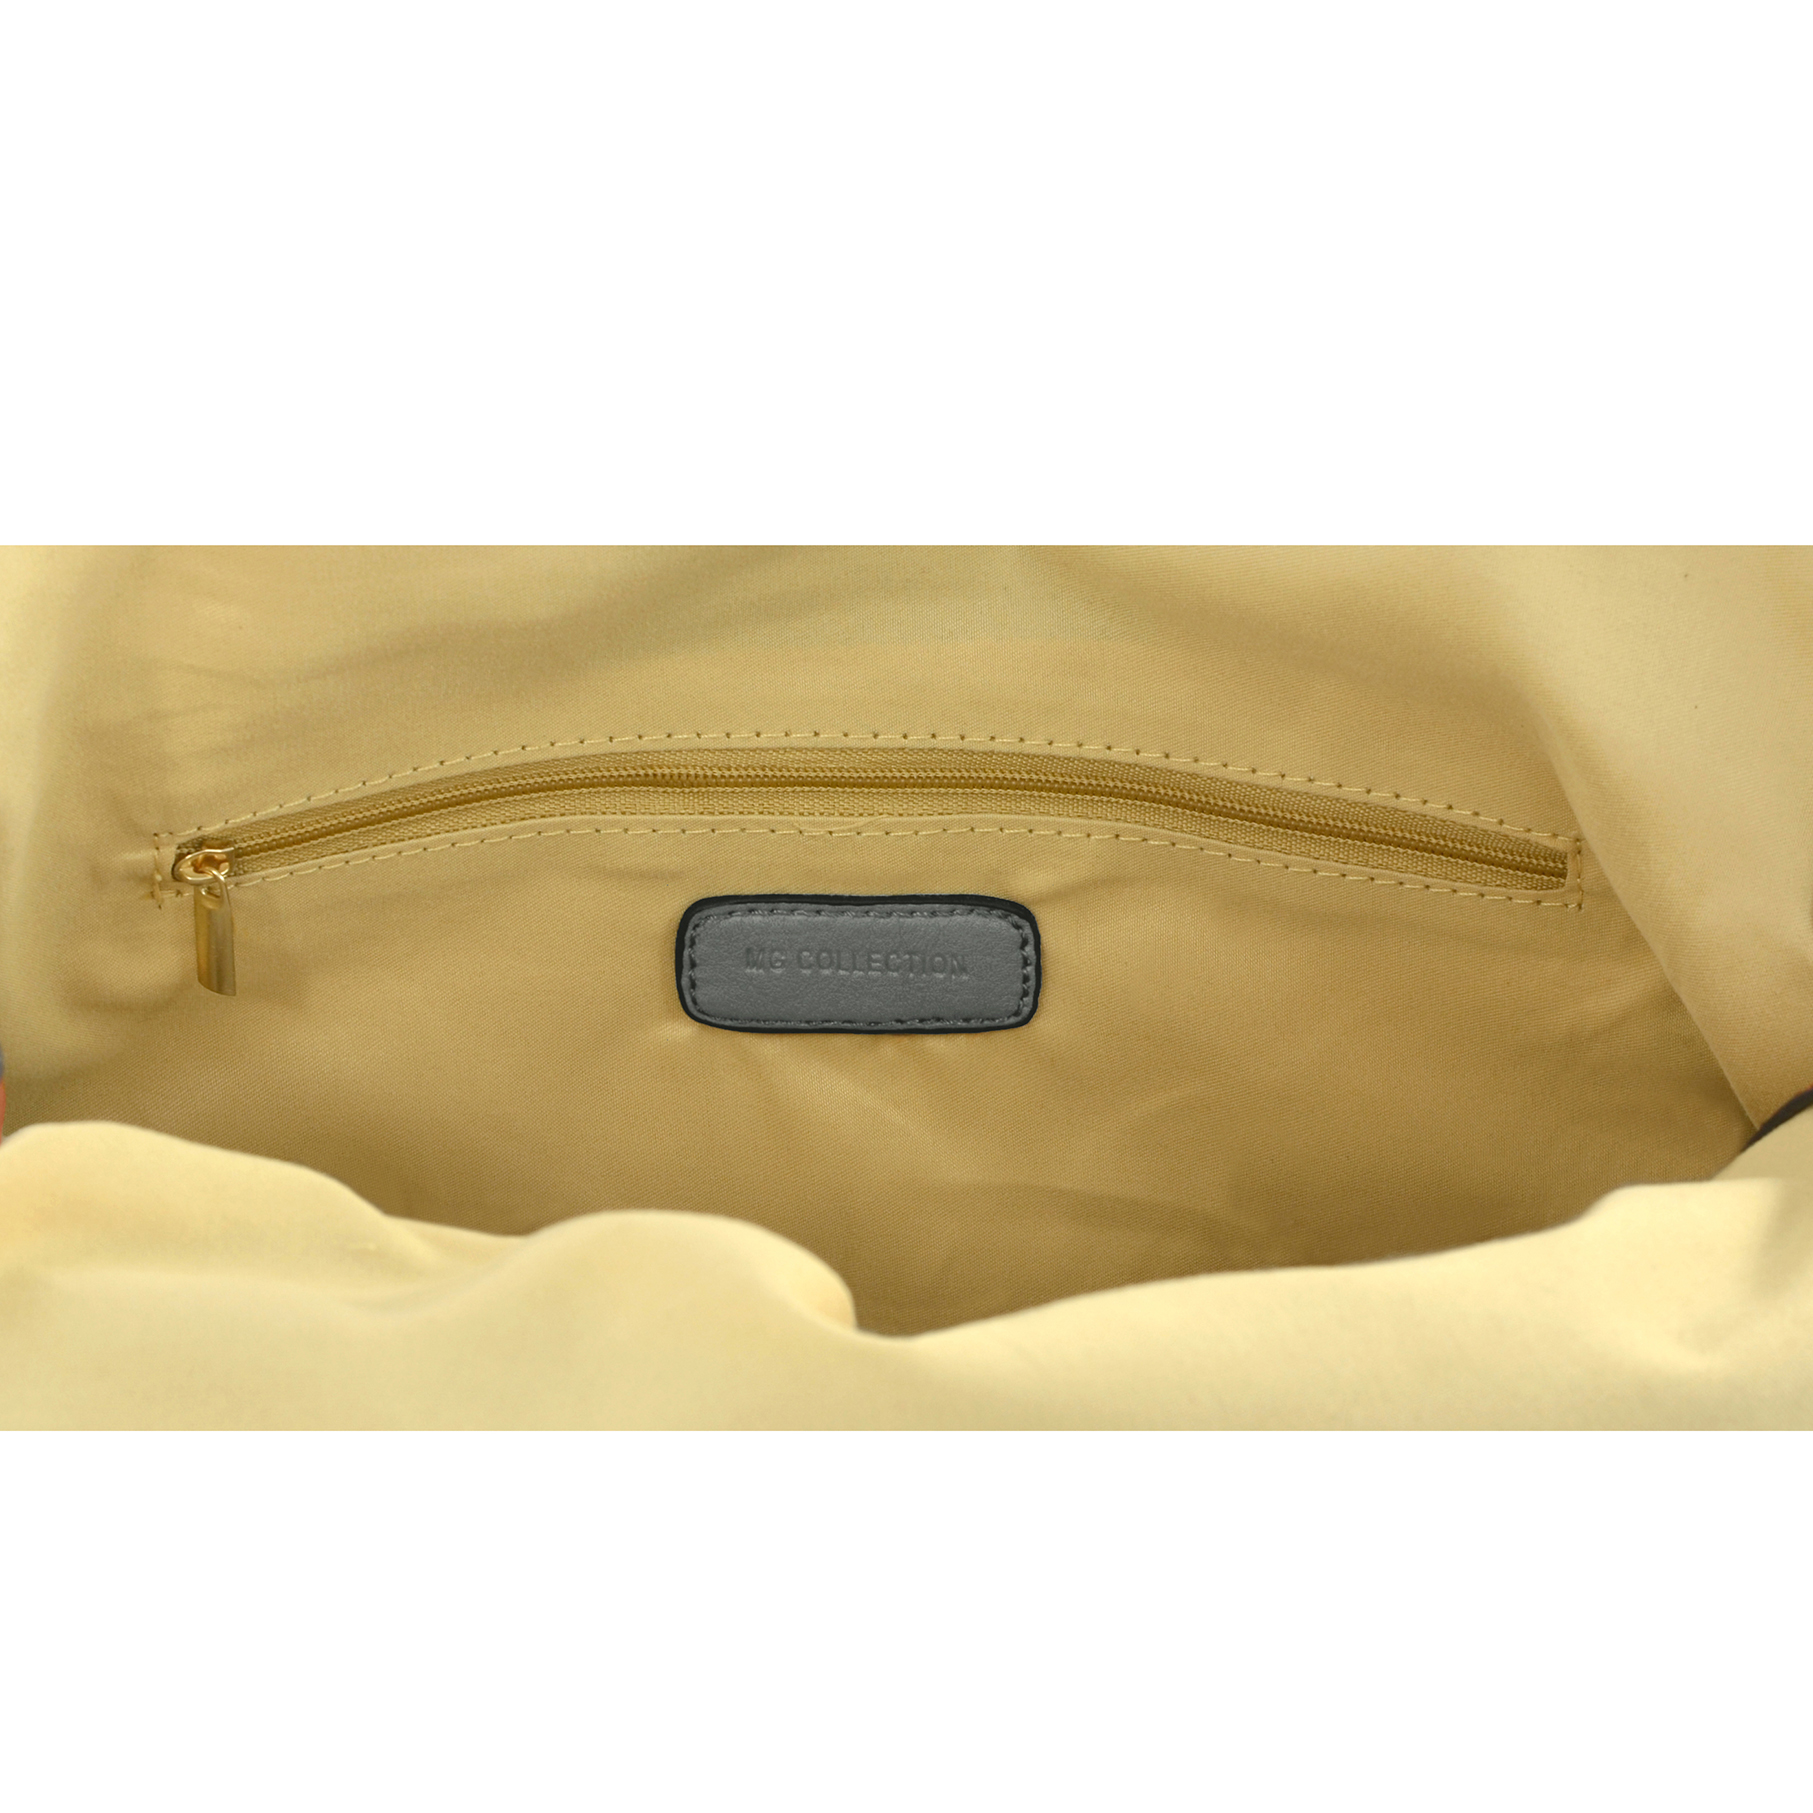 SAMANTHA Dark Grey Weave Pattern Soft Hobo Handbag inside